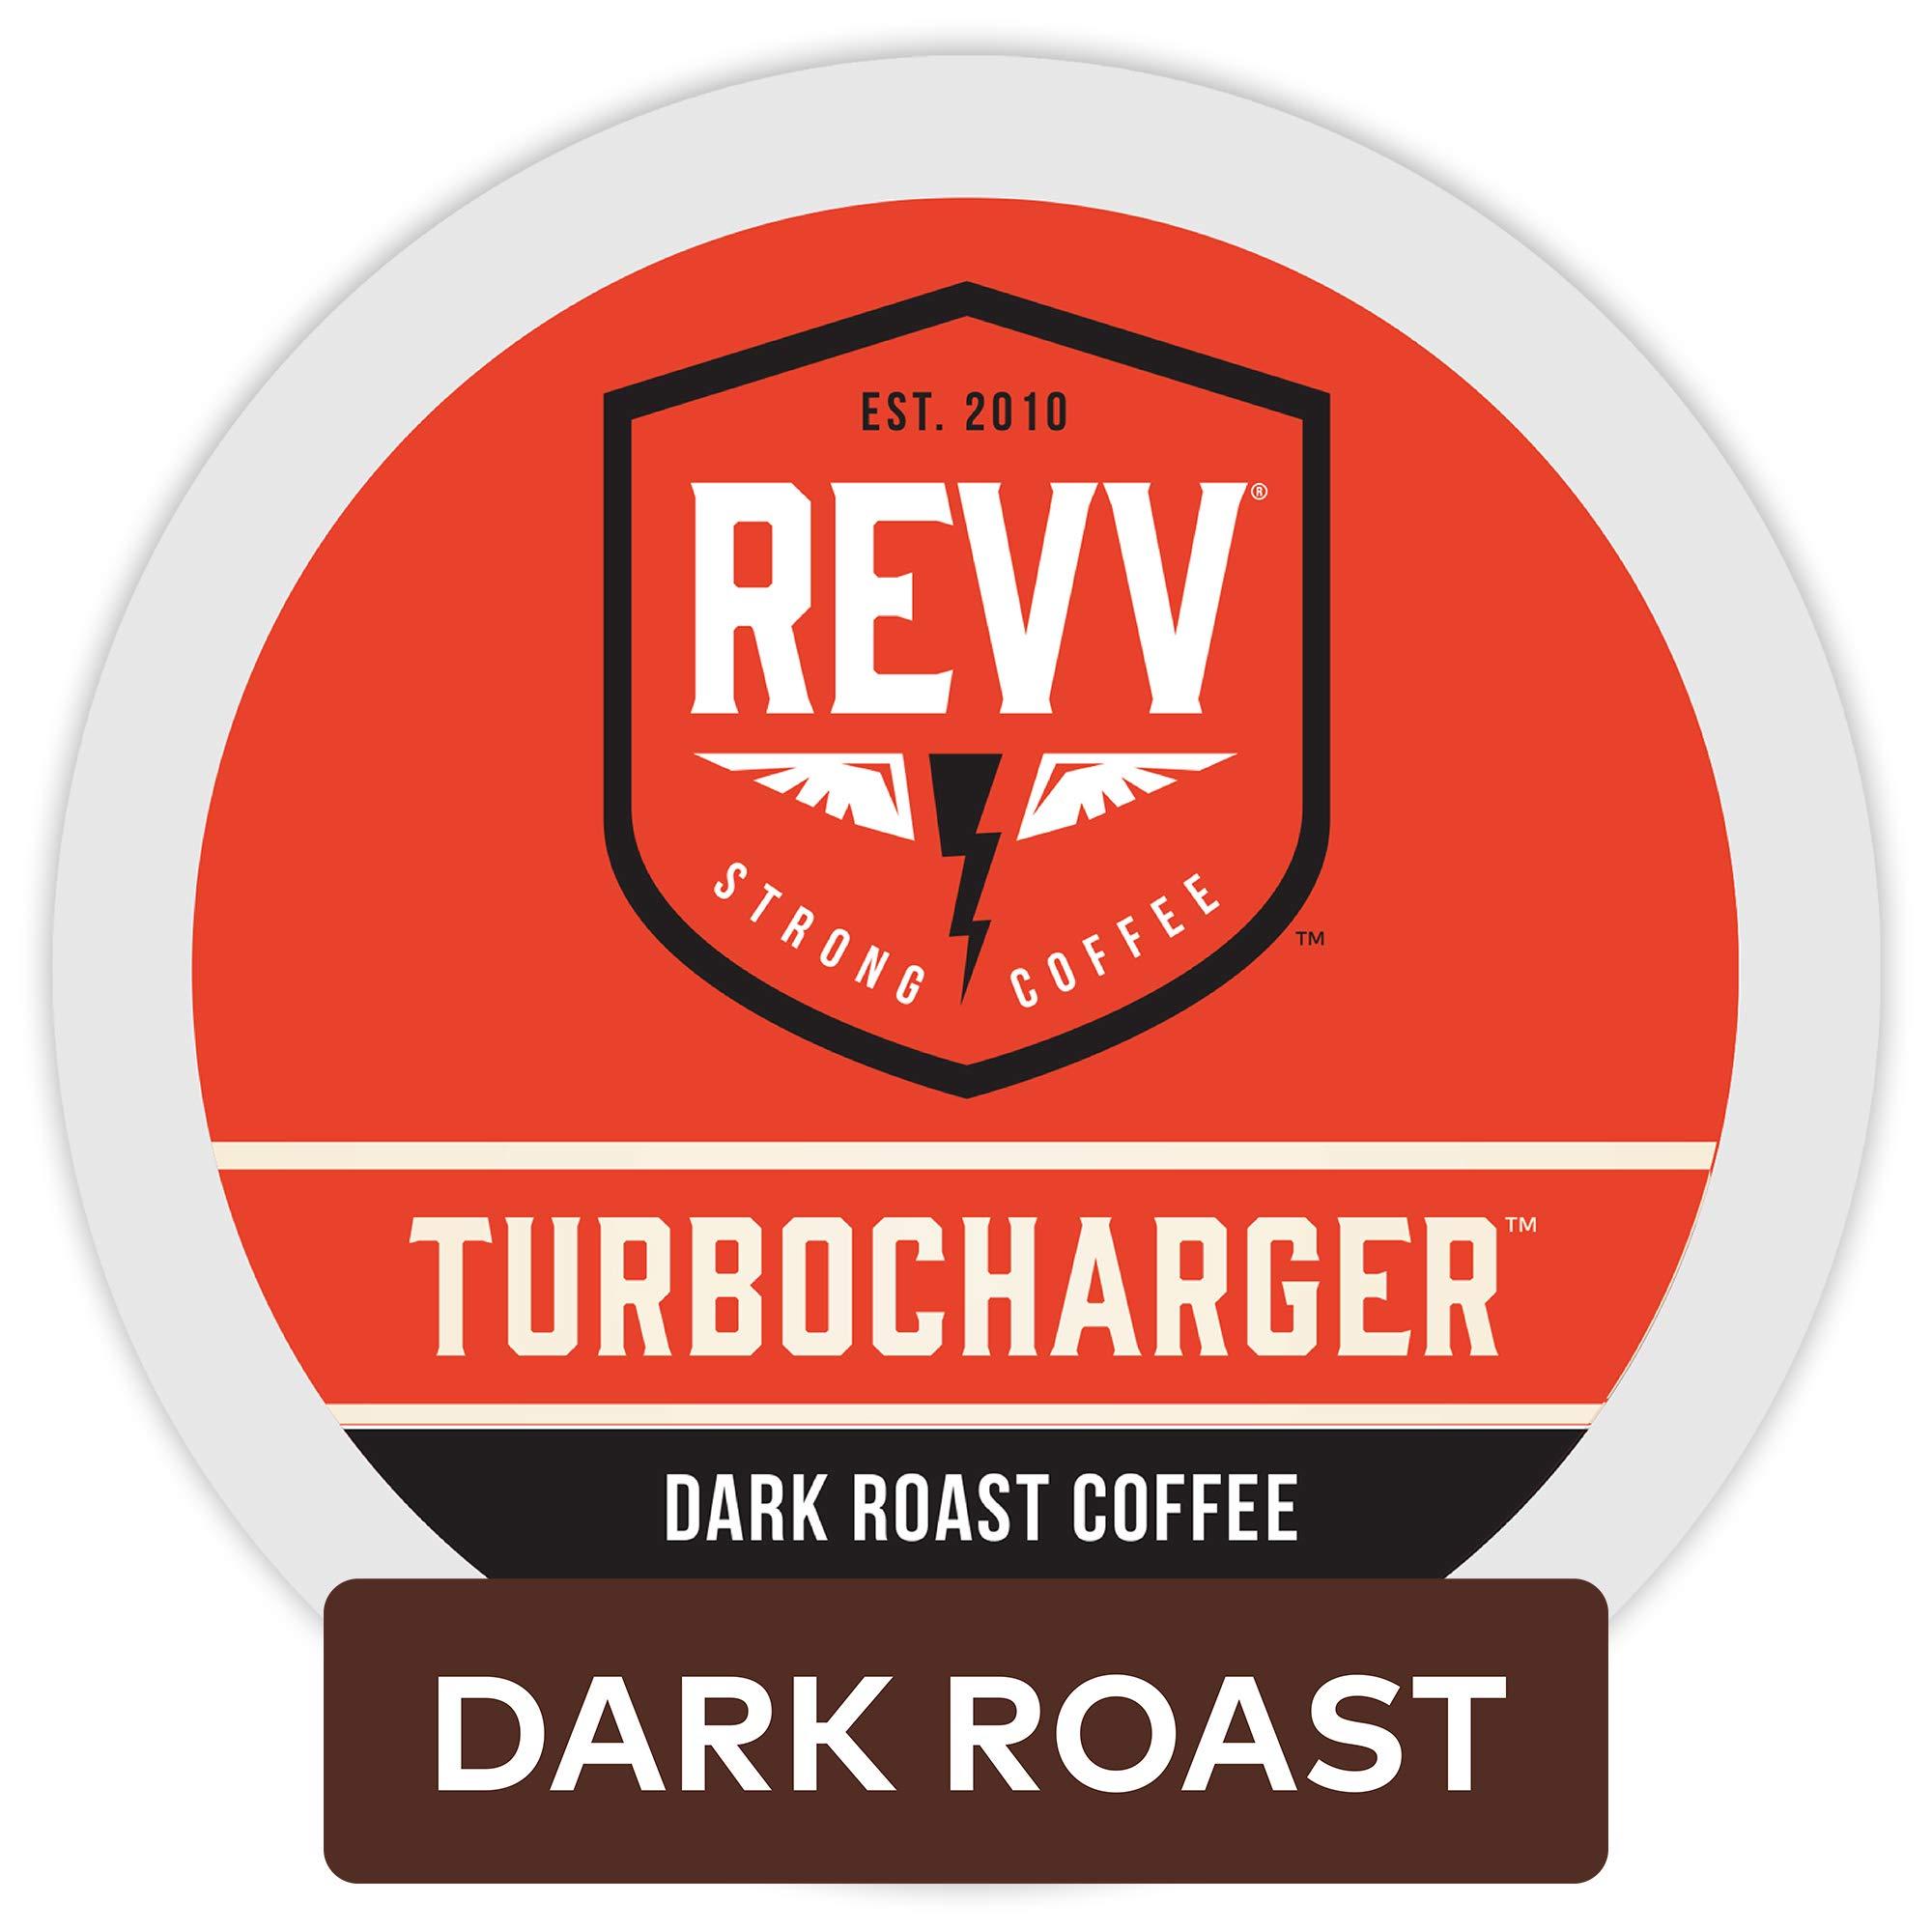 Revv Turbocharger, Single Serve Coffee K Cup Pods for Keurig Brewers, Dark Roast, 96Count